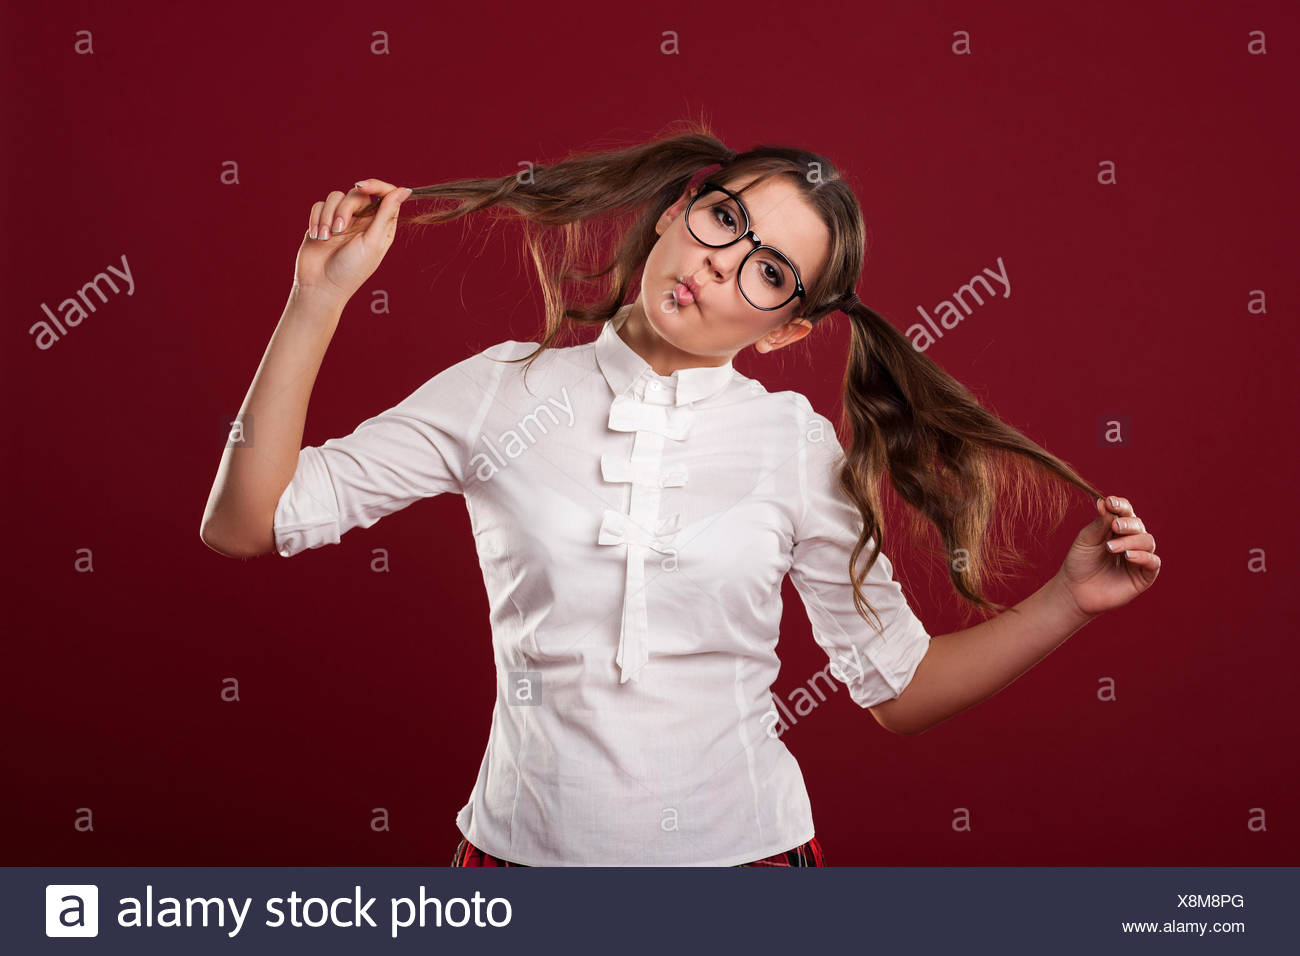 Unfashionable Woman Stock Photos Unfashionable Woman Stock 1300x956